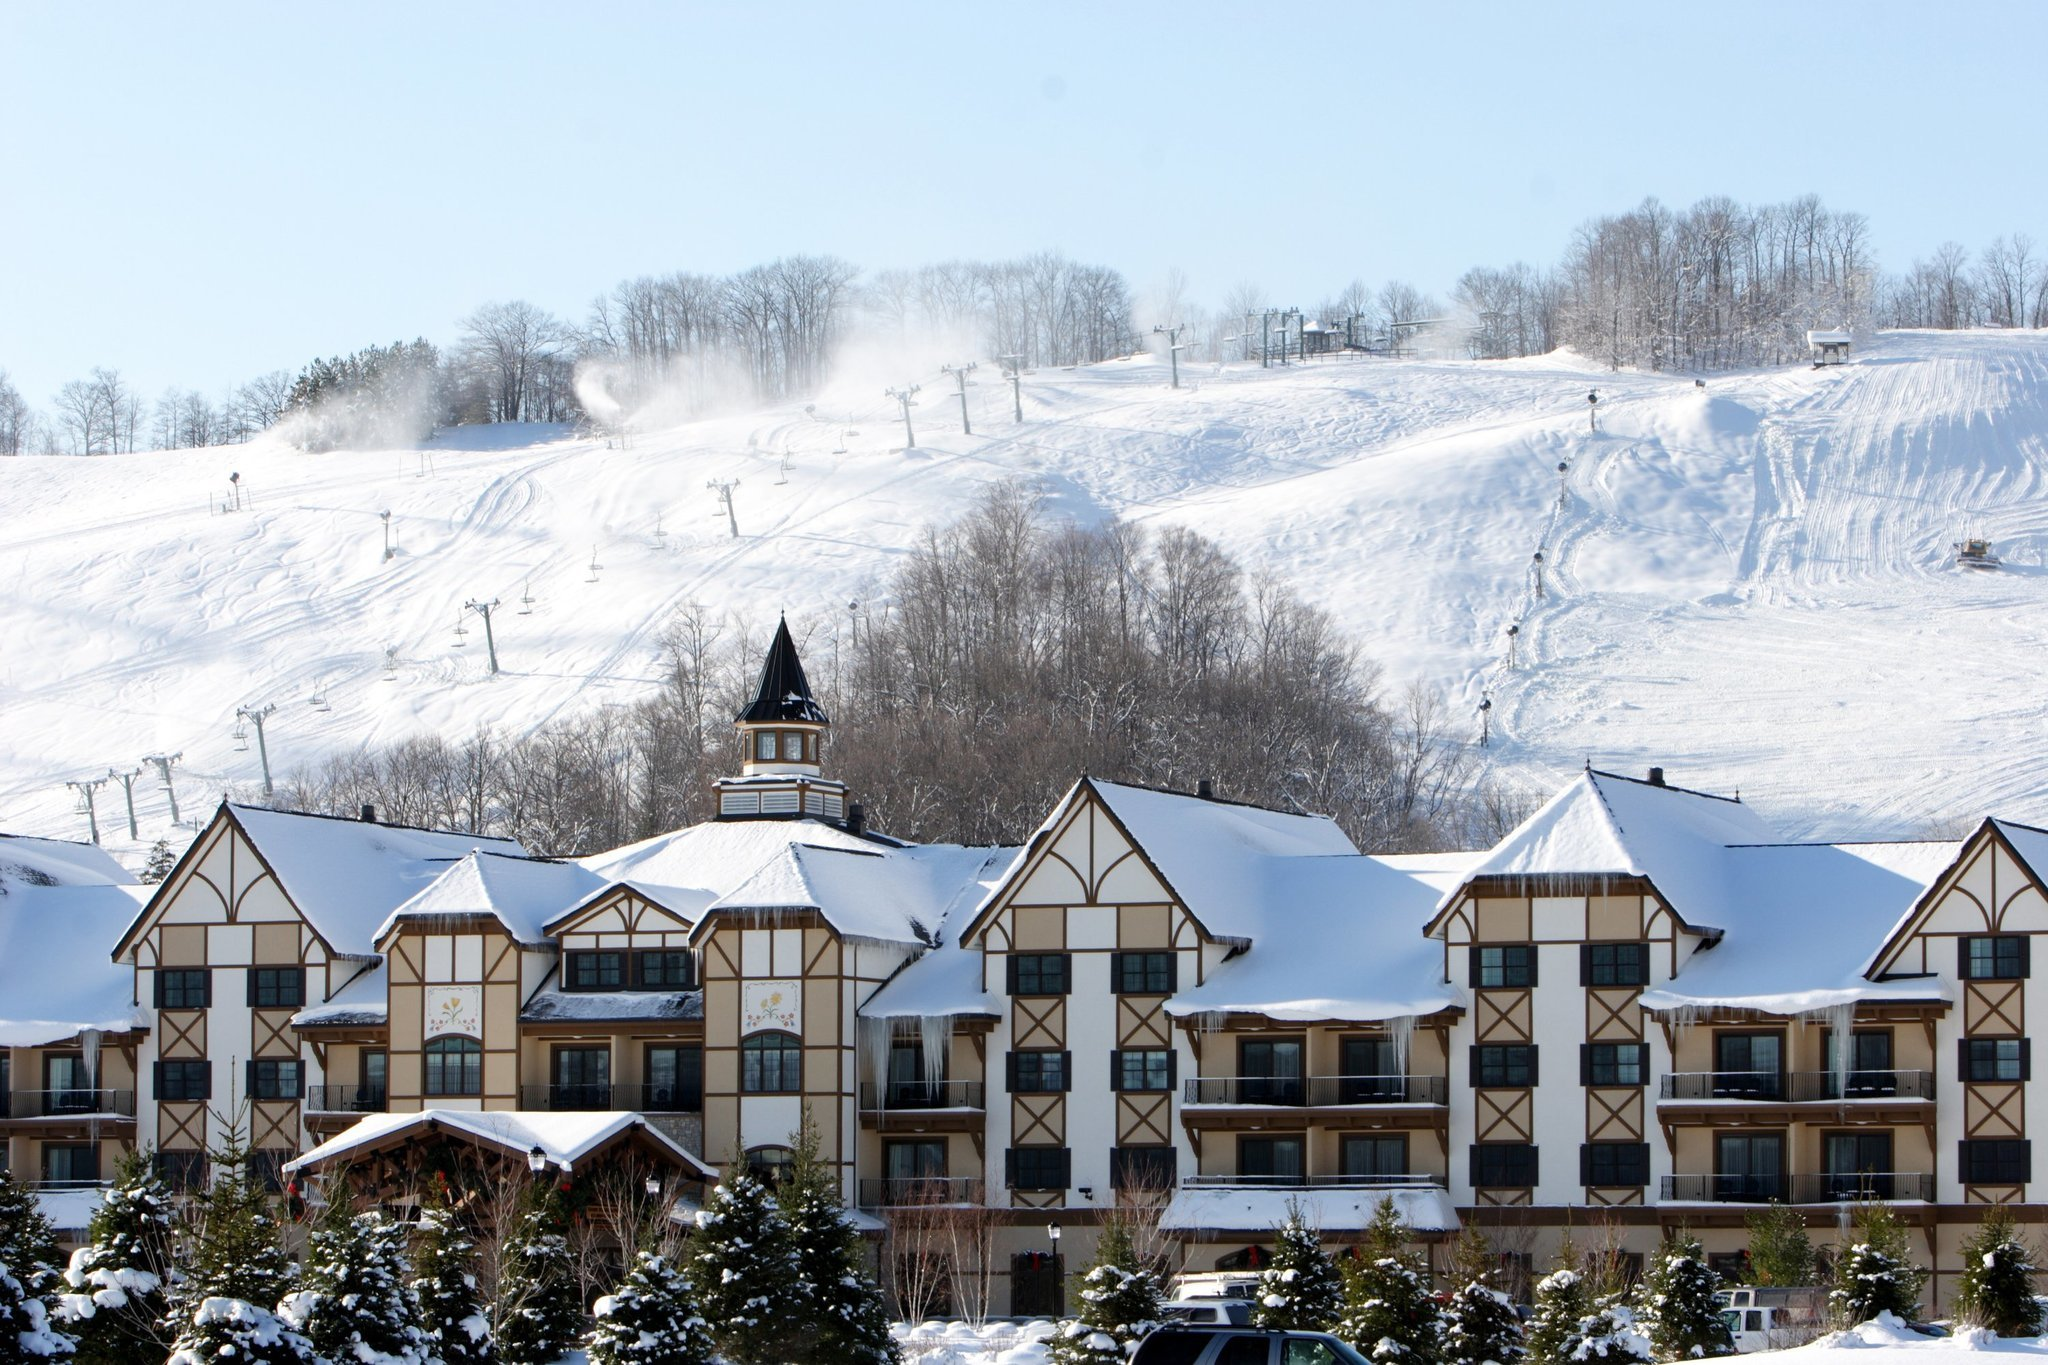 michigan-based boyne completes purchase of 6 ski resorts - chicago